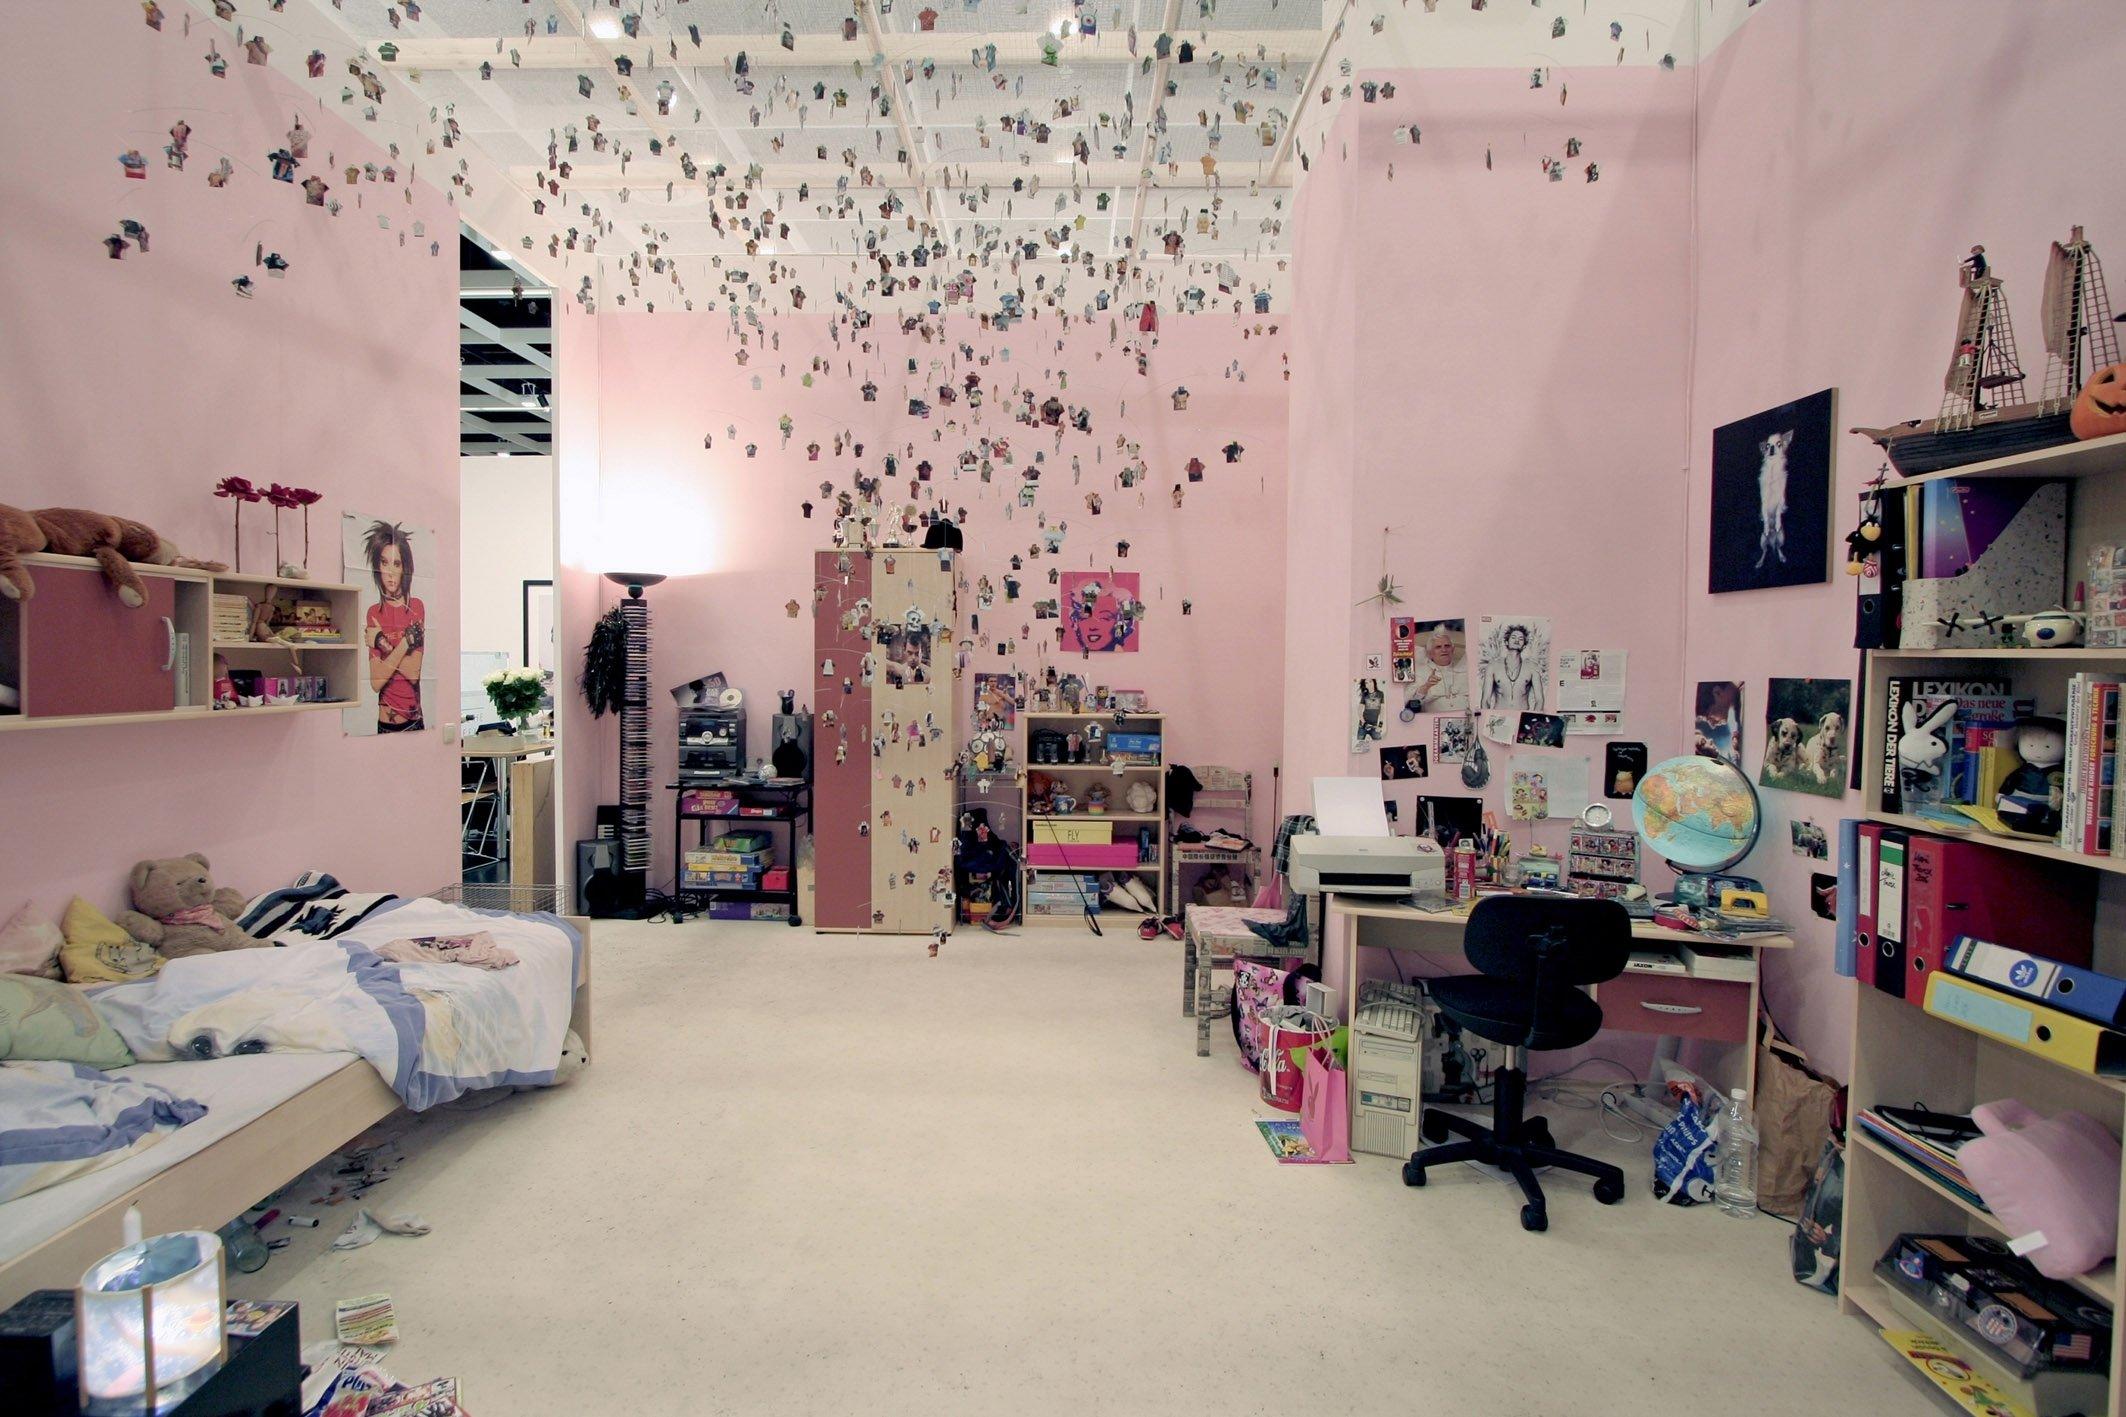 10 Cute Dorm Room Decorating Ideas Diy cheap dorm room decor deas campuslately